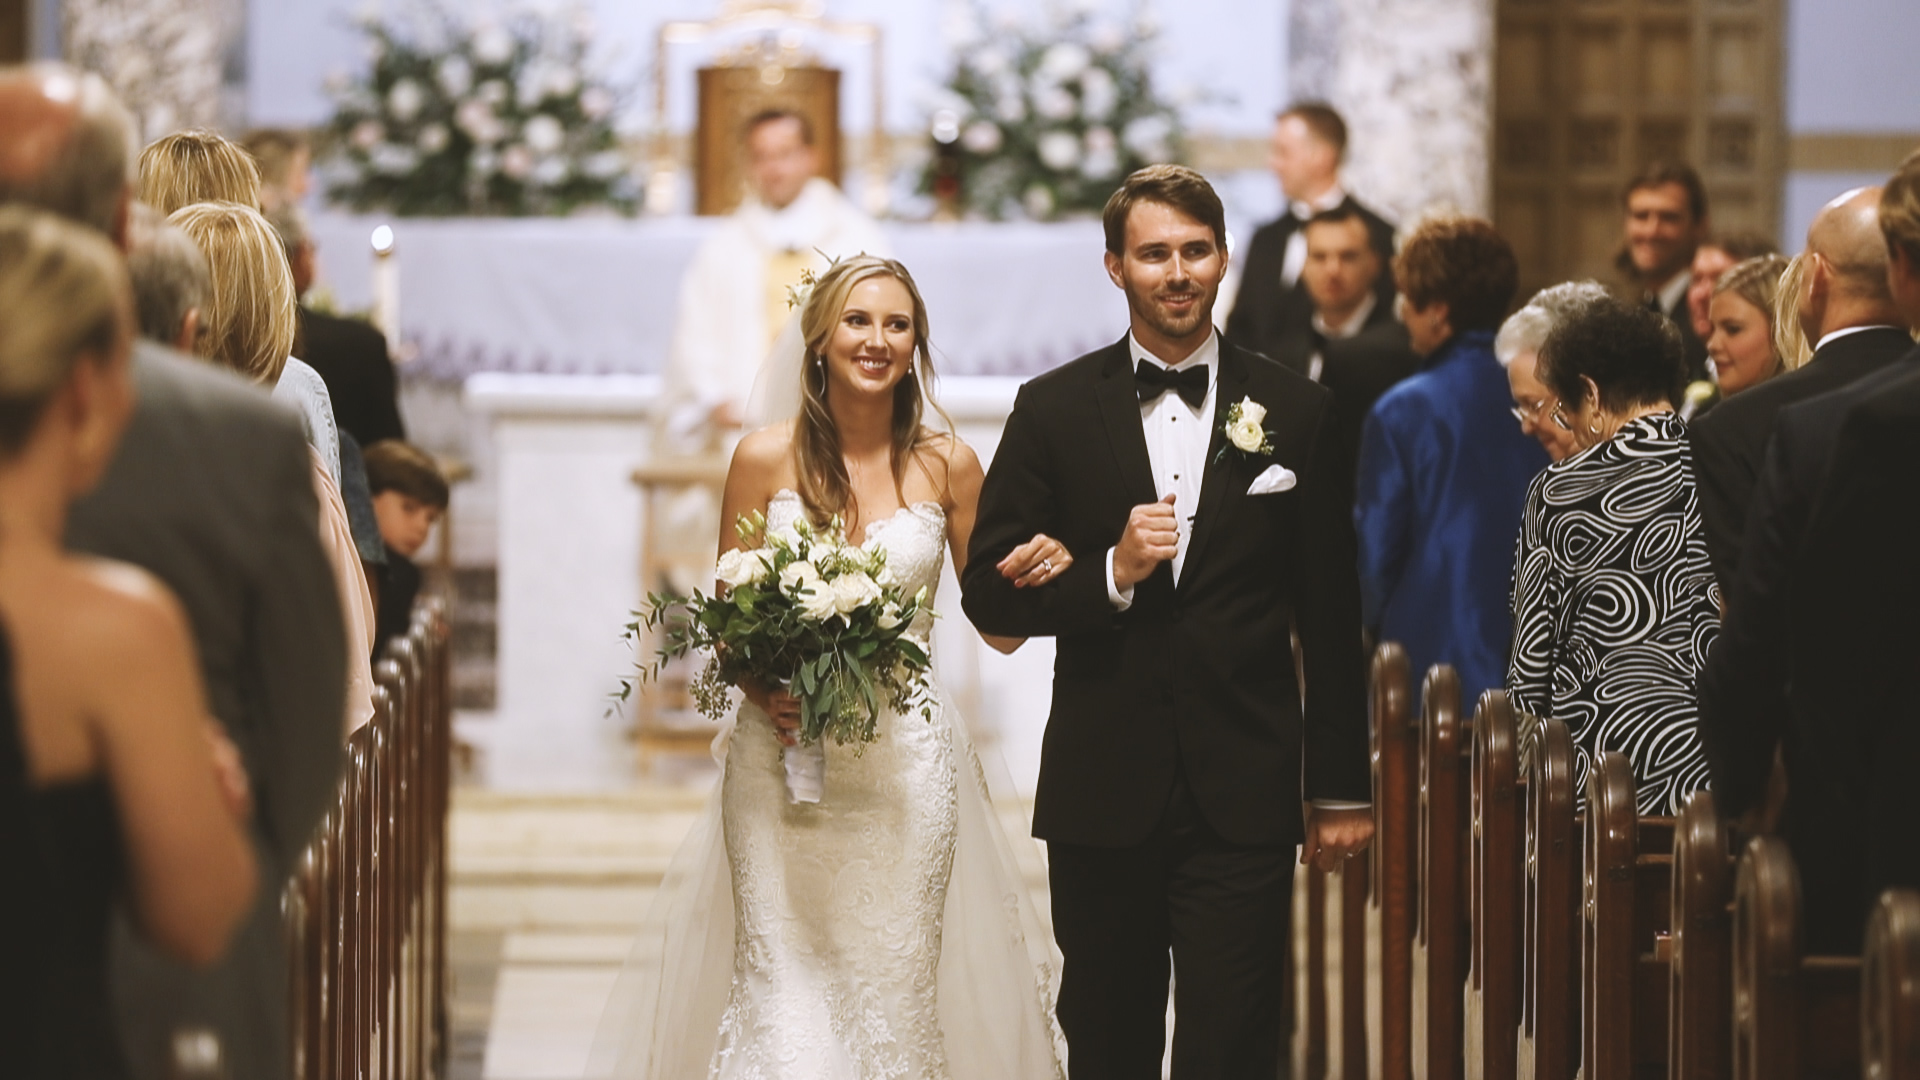 Wedding Ceremony - Bride Film